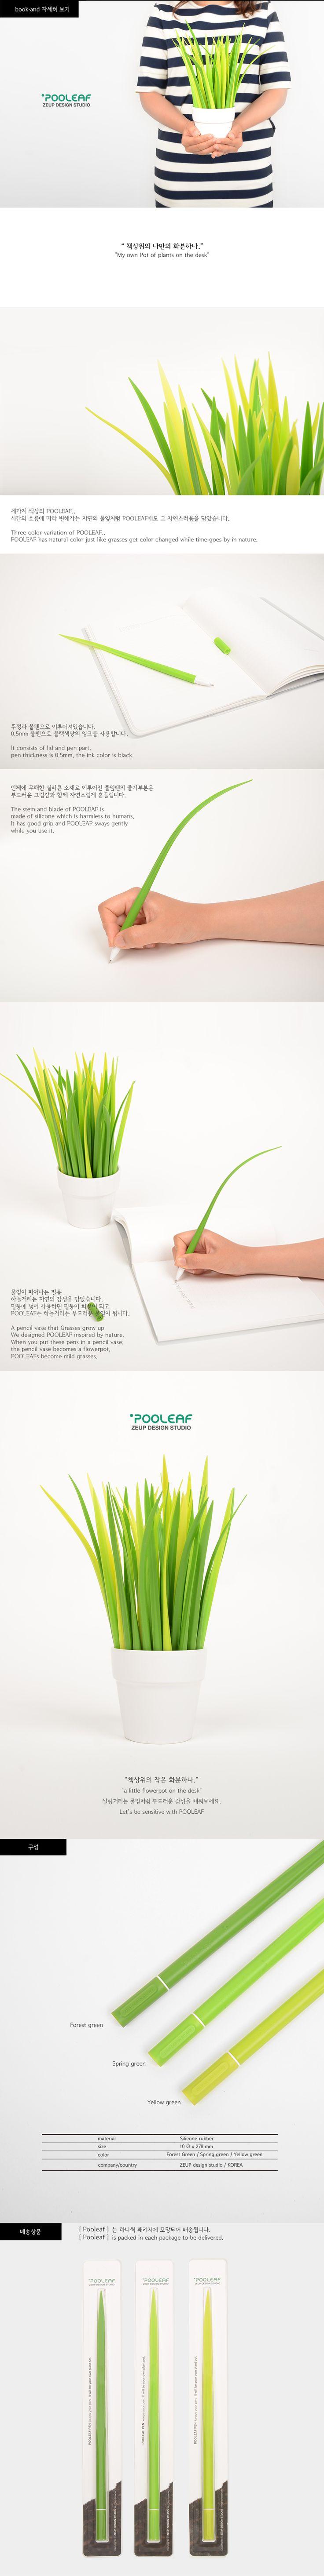 Leaf pens by connect design